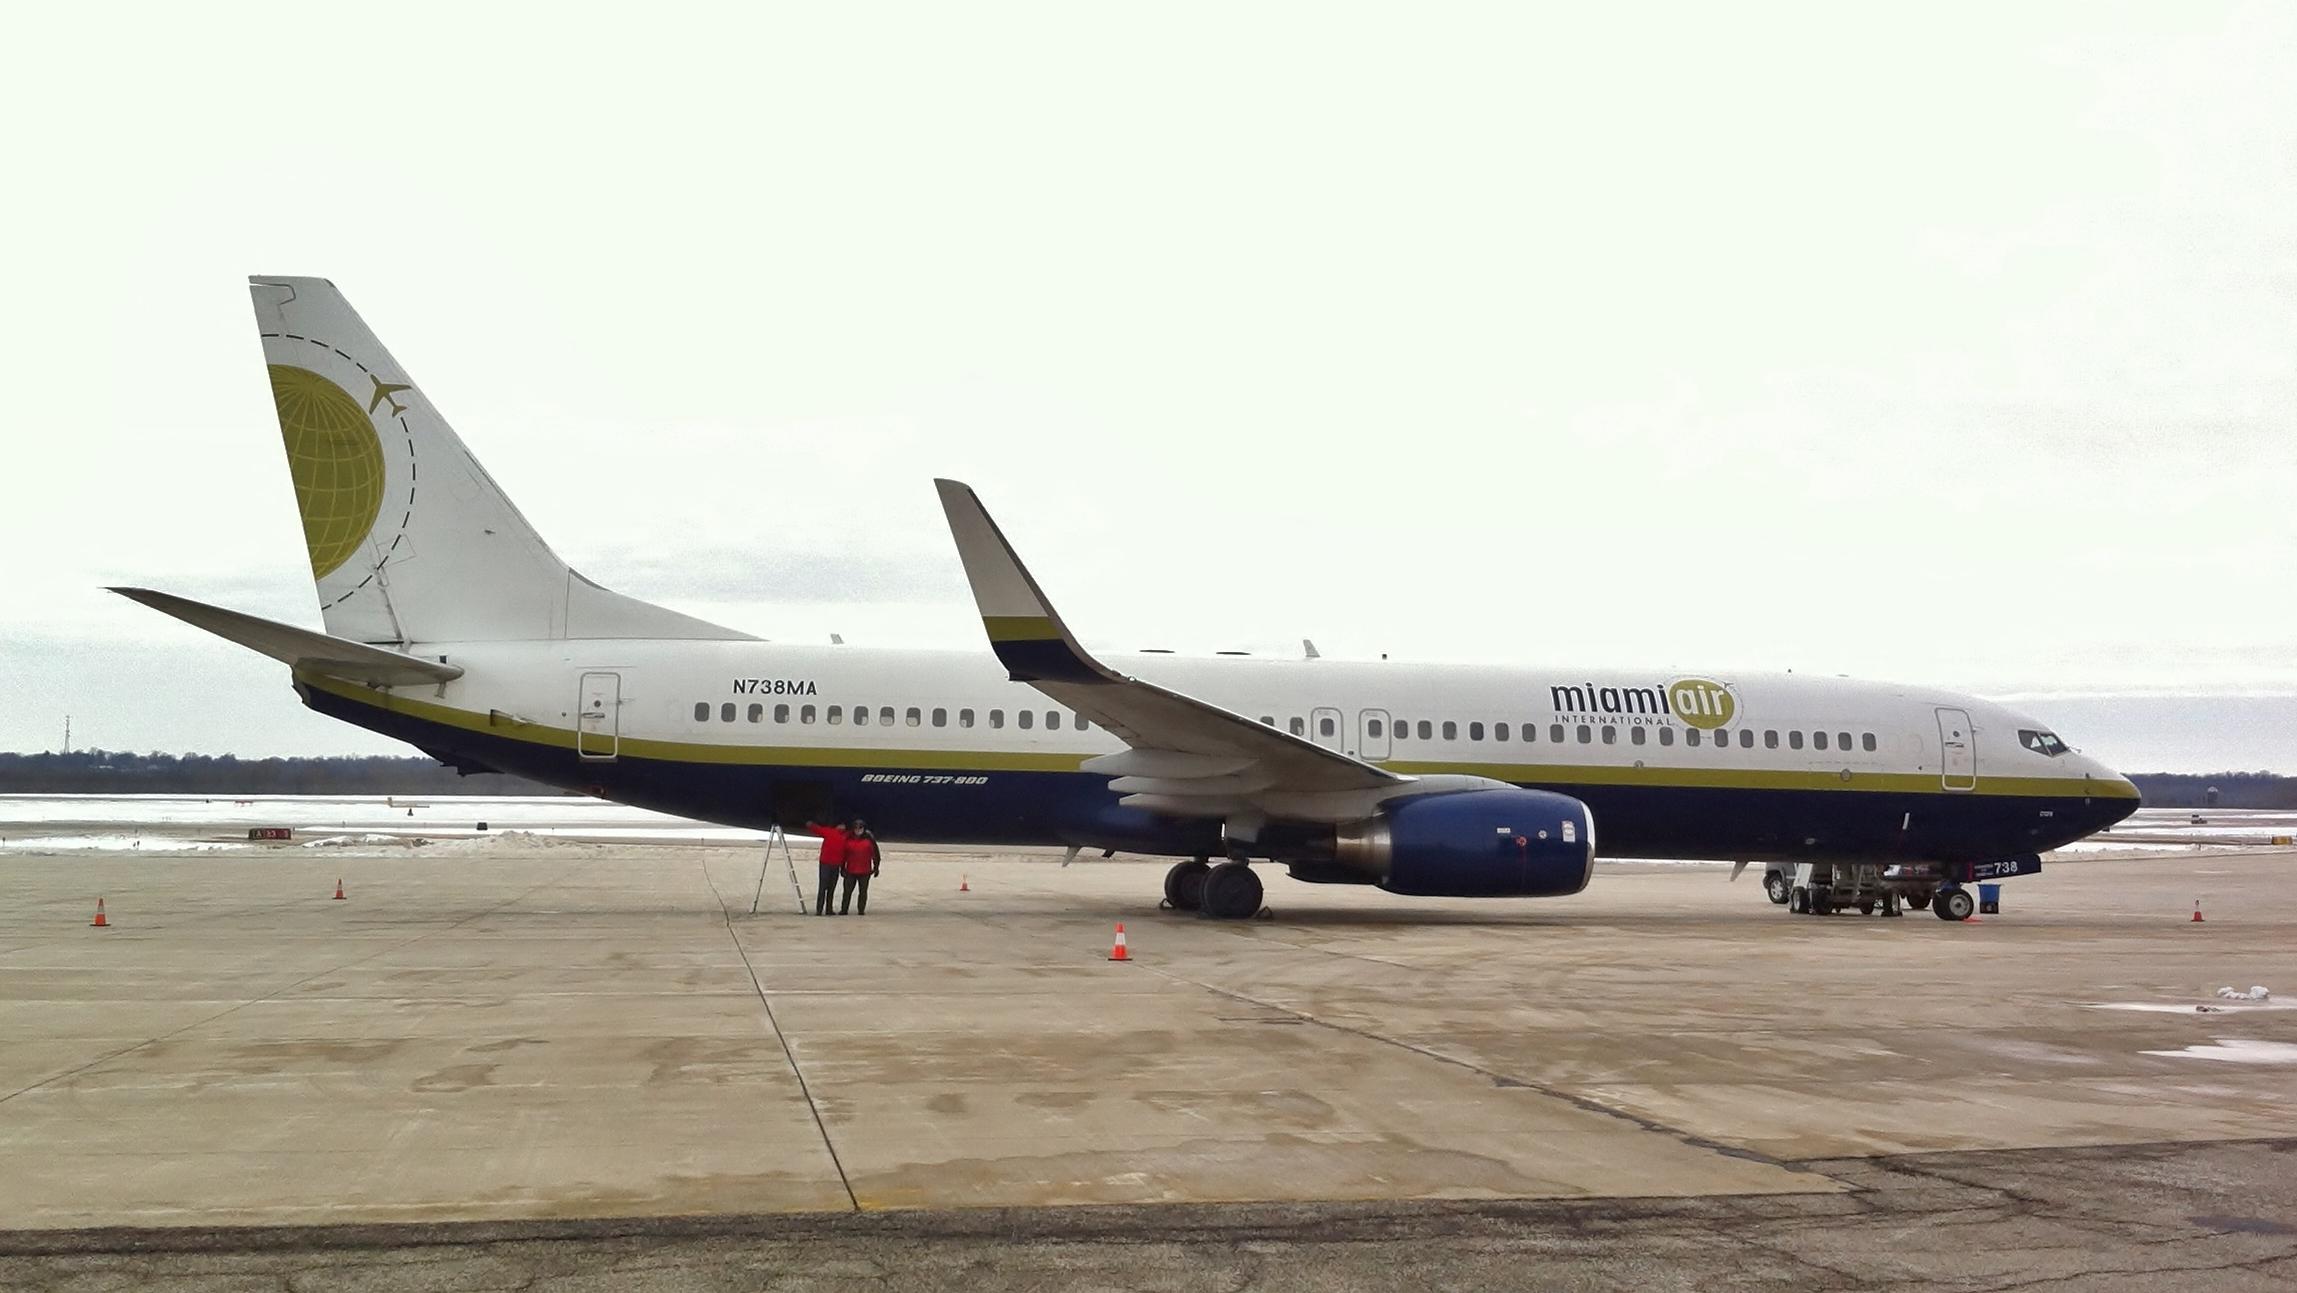 File:Miami Air 737-800.JPG - Wikimedia Commons